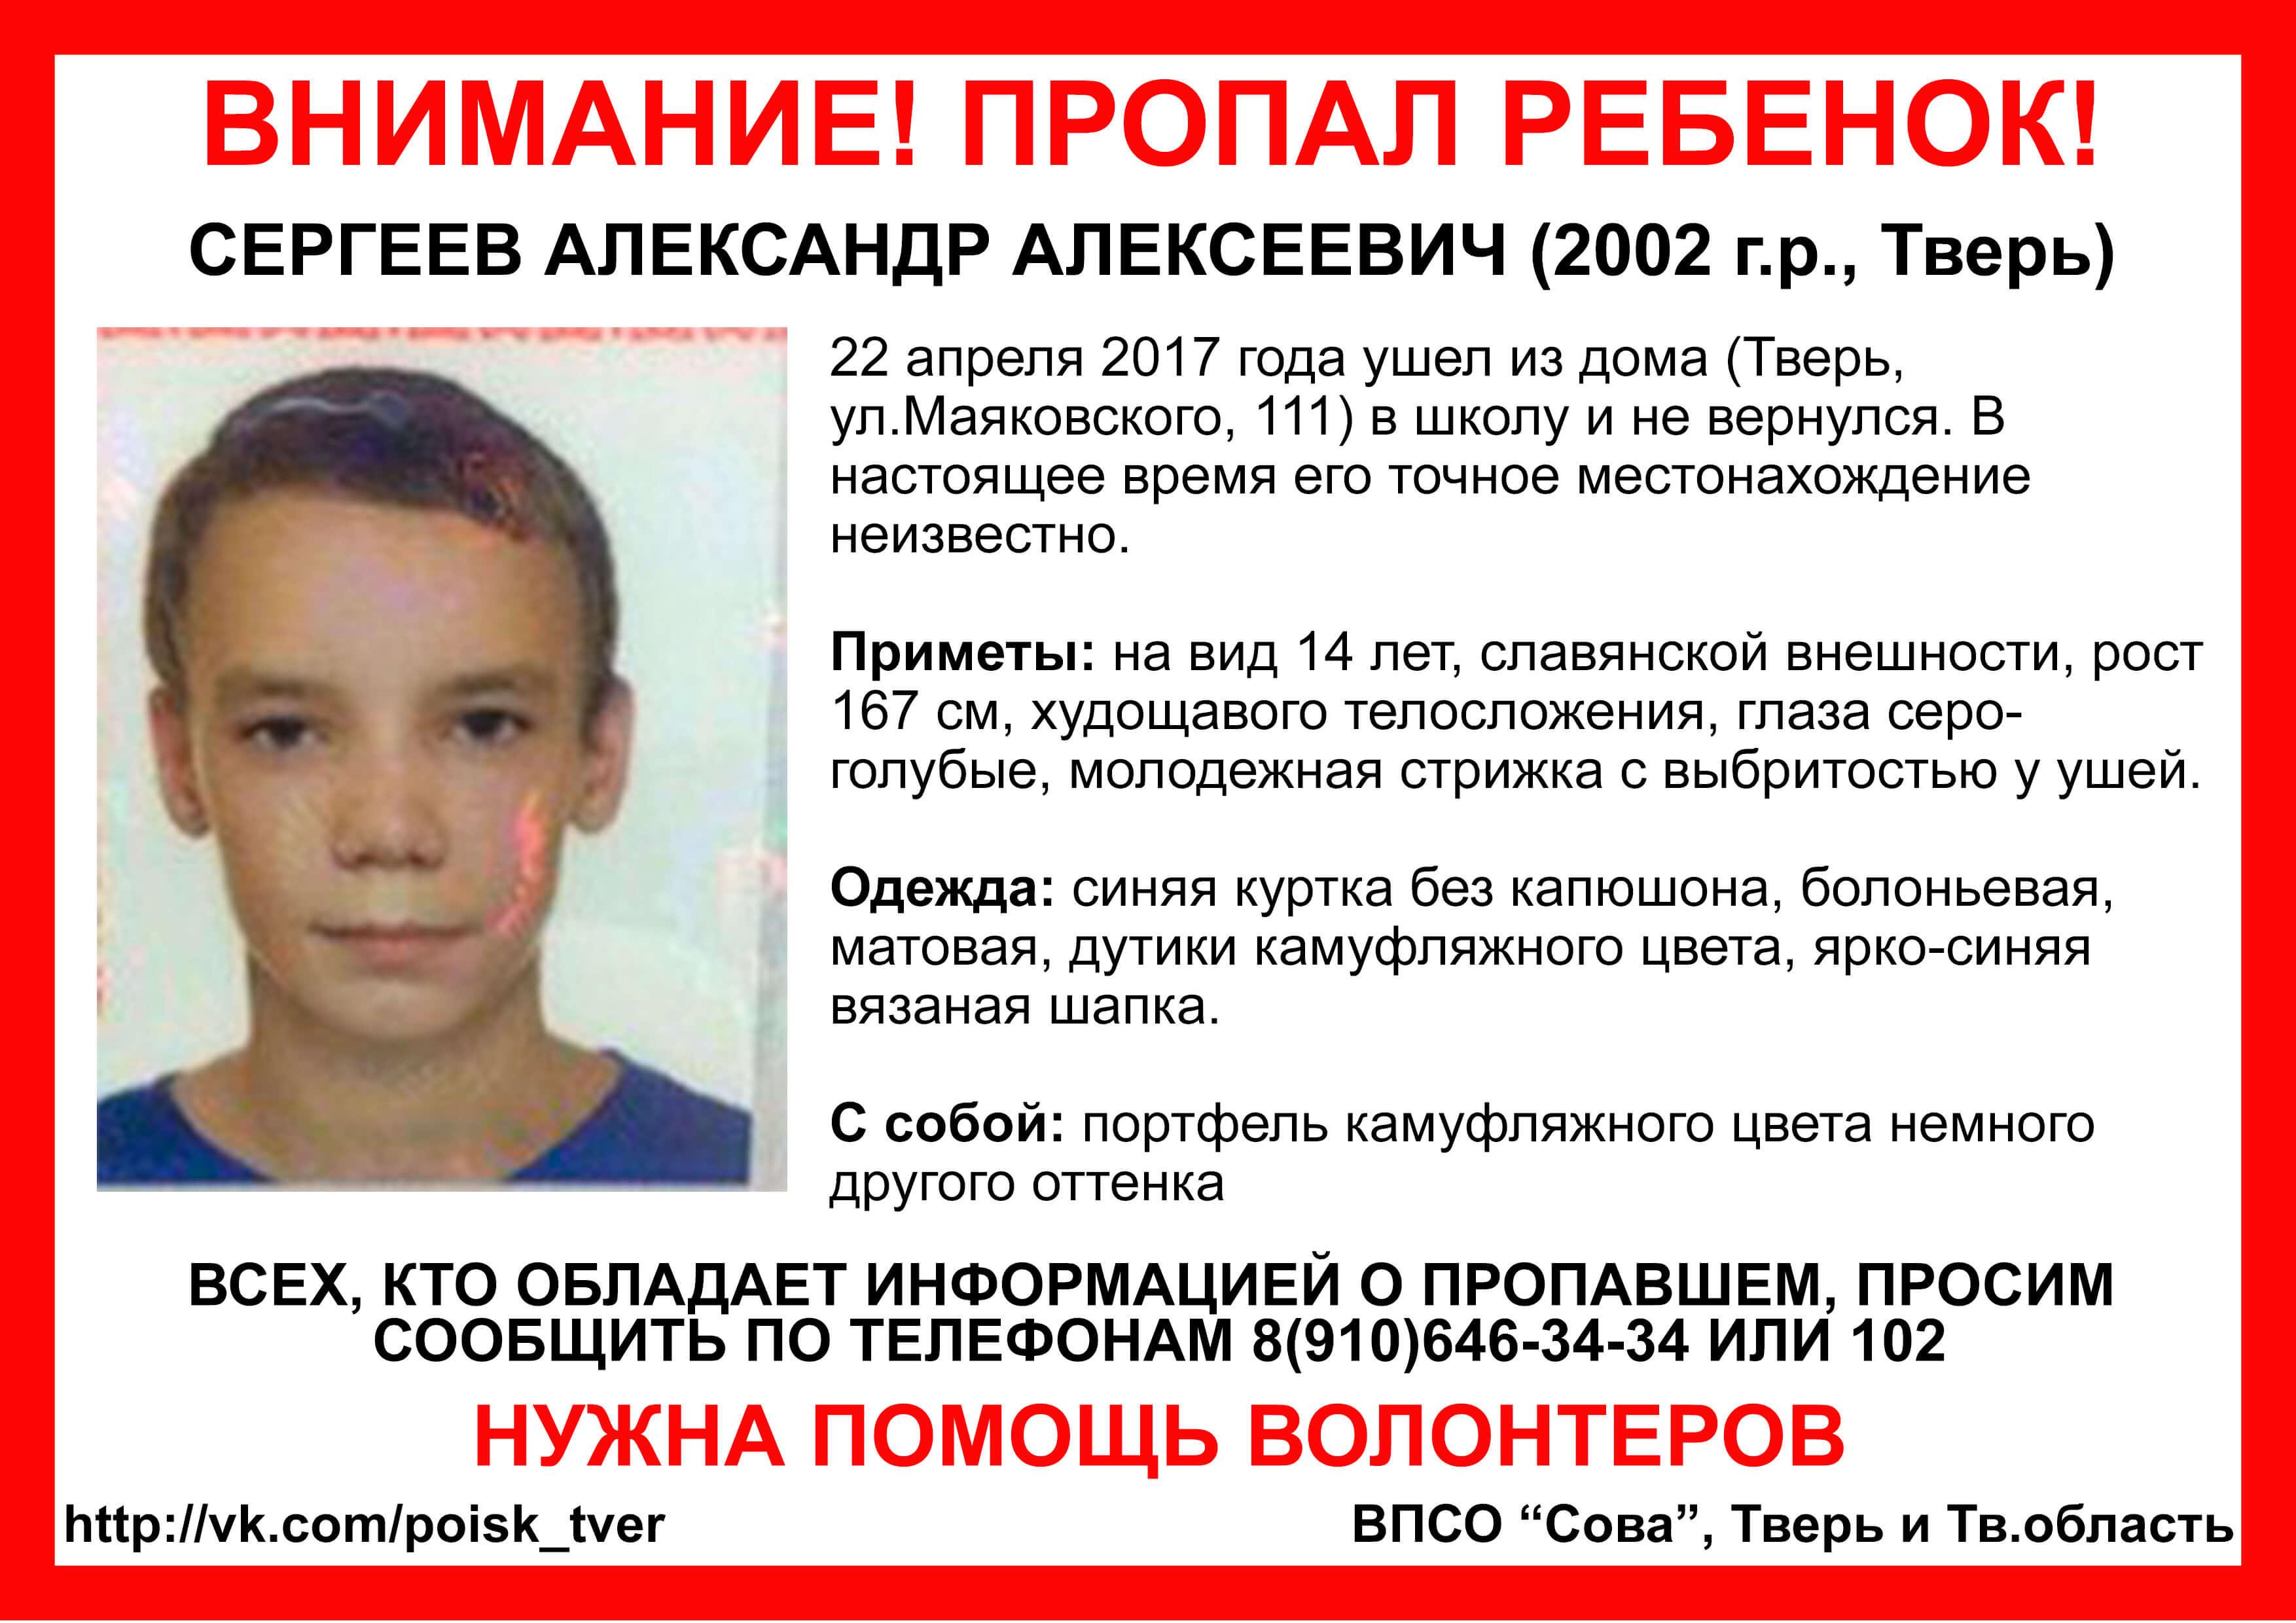 (Найден, жив) В Твери разыскивают пропавшего ребенка